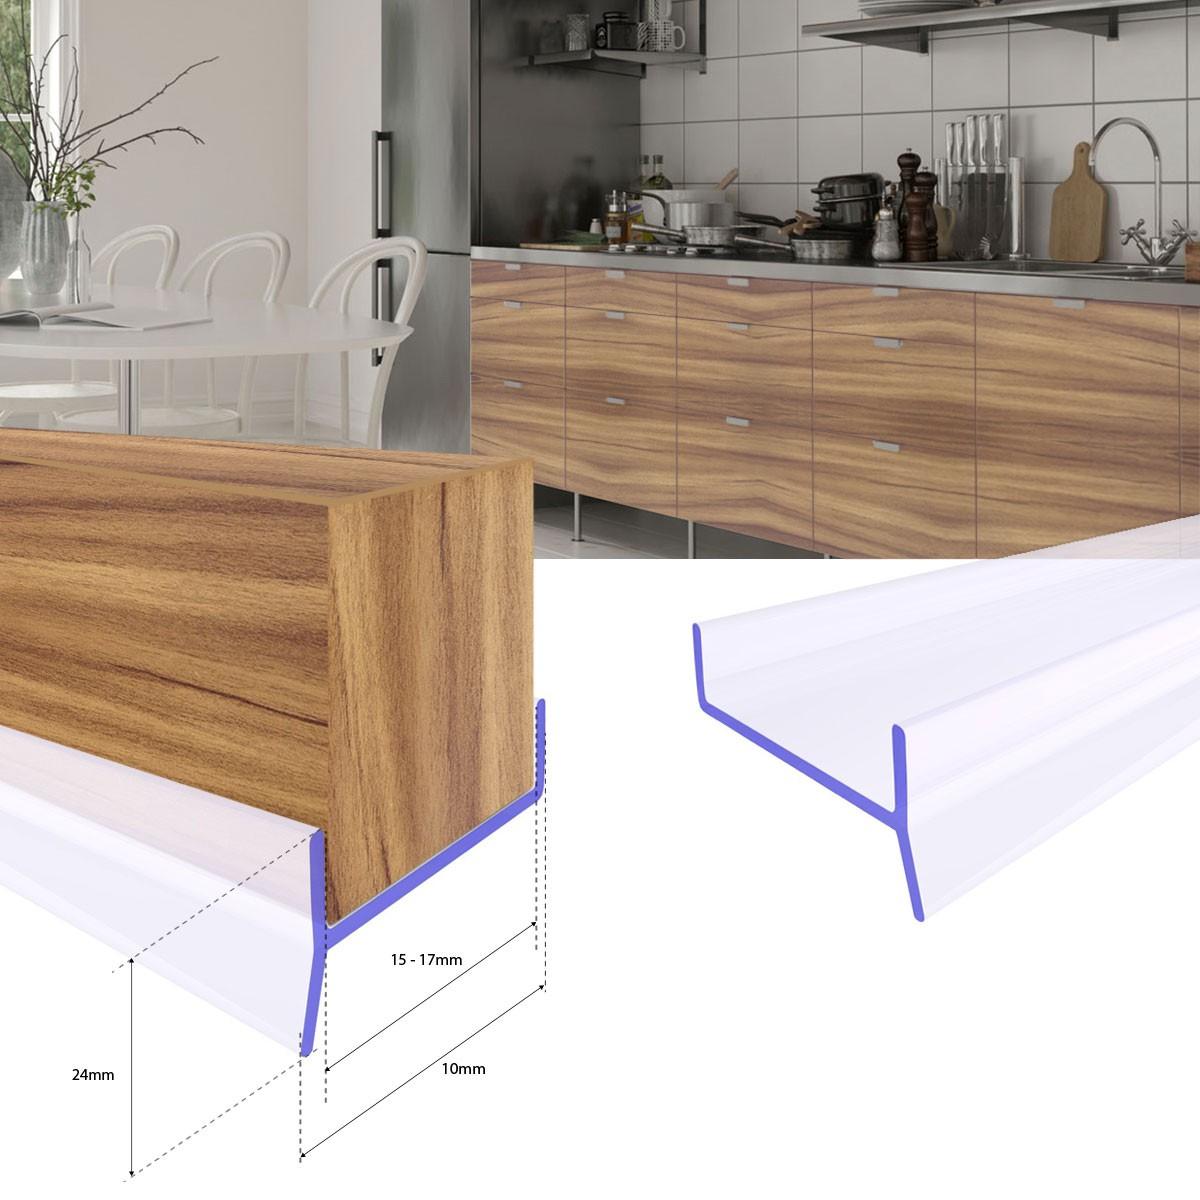 k chensockel abdichtungsprofil 15 19mm sockel dichtung erneuern 1 5m dichtprofil ebay. Black Bedroom Furniture Sets. Home Design Ideas